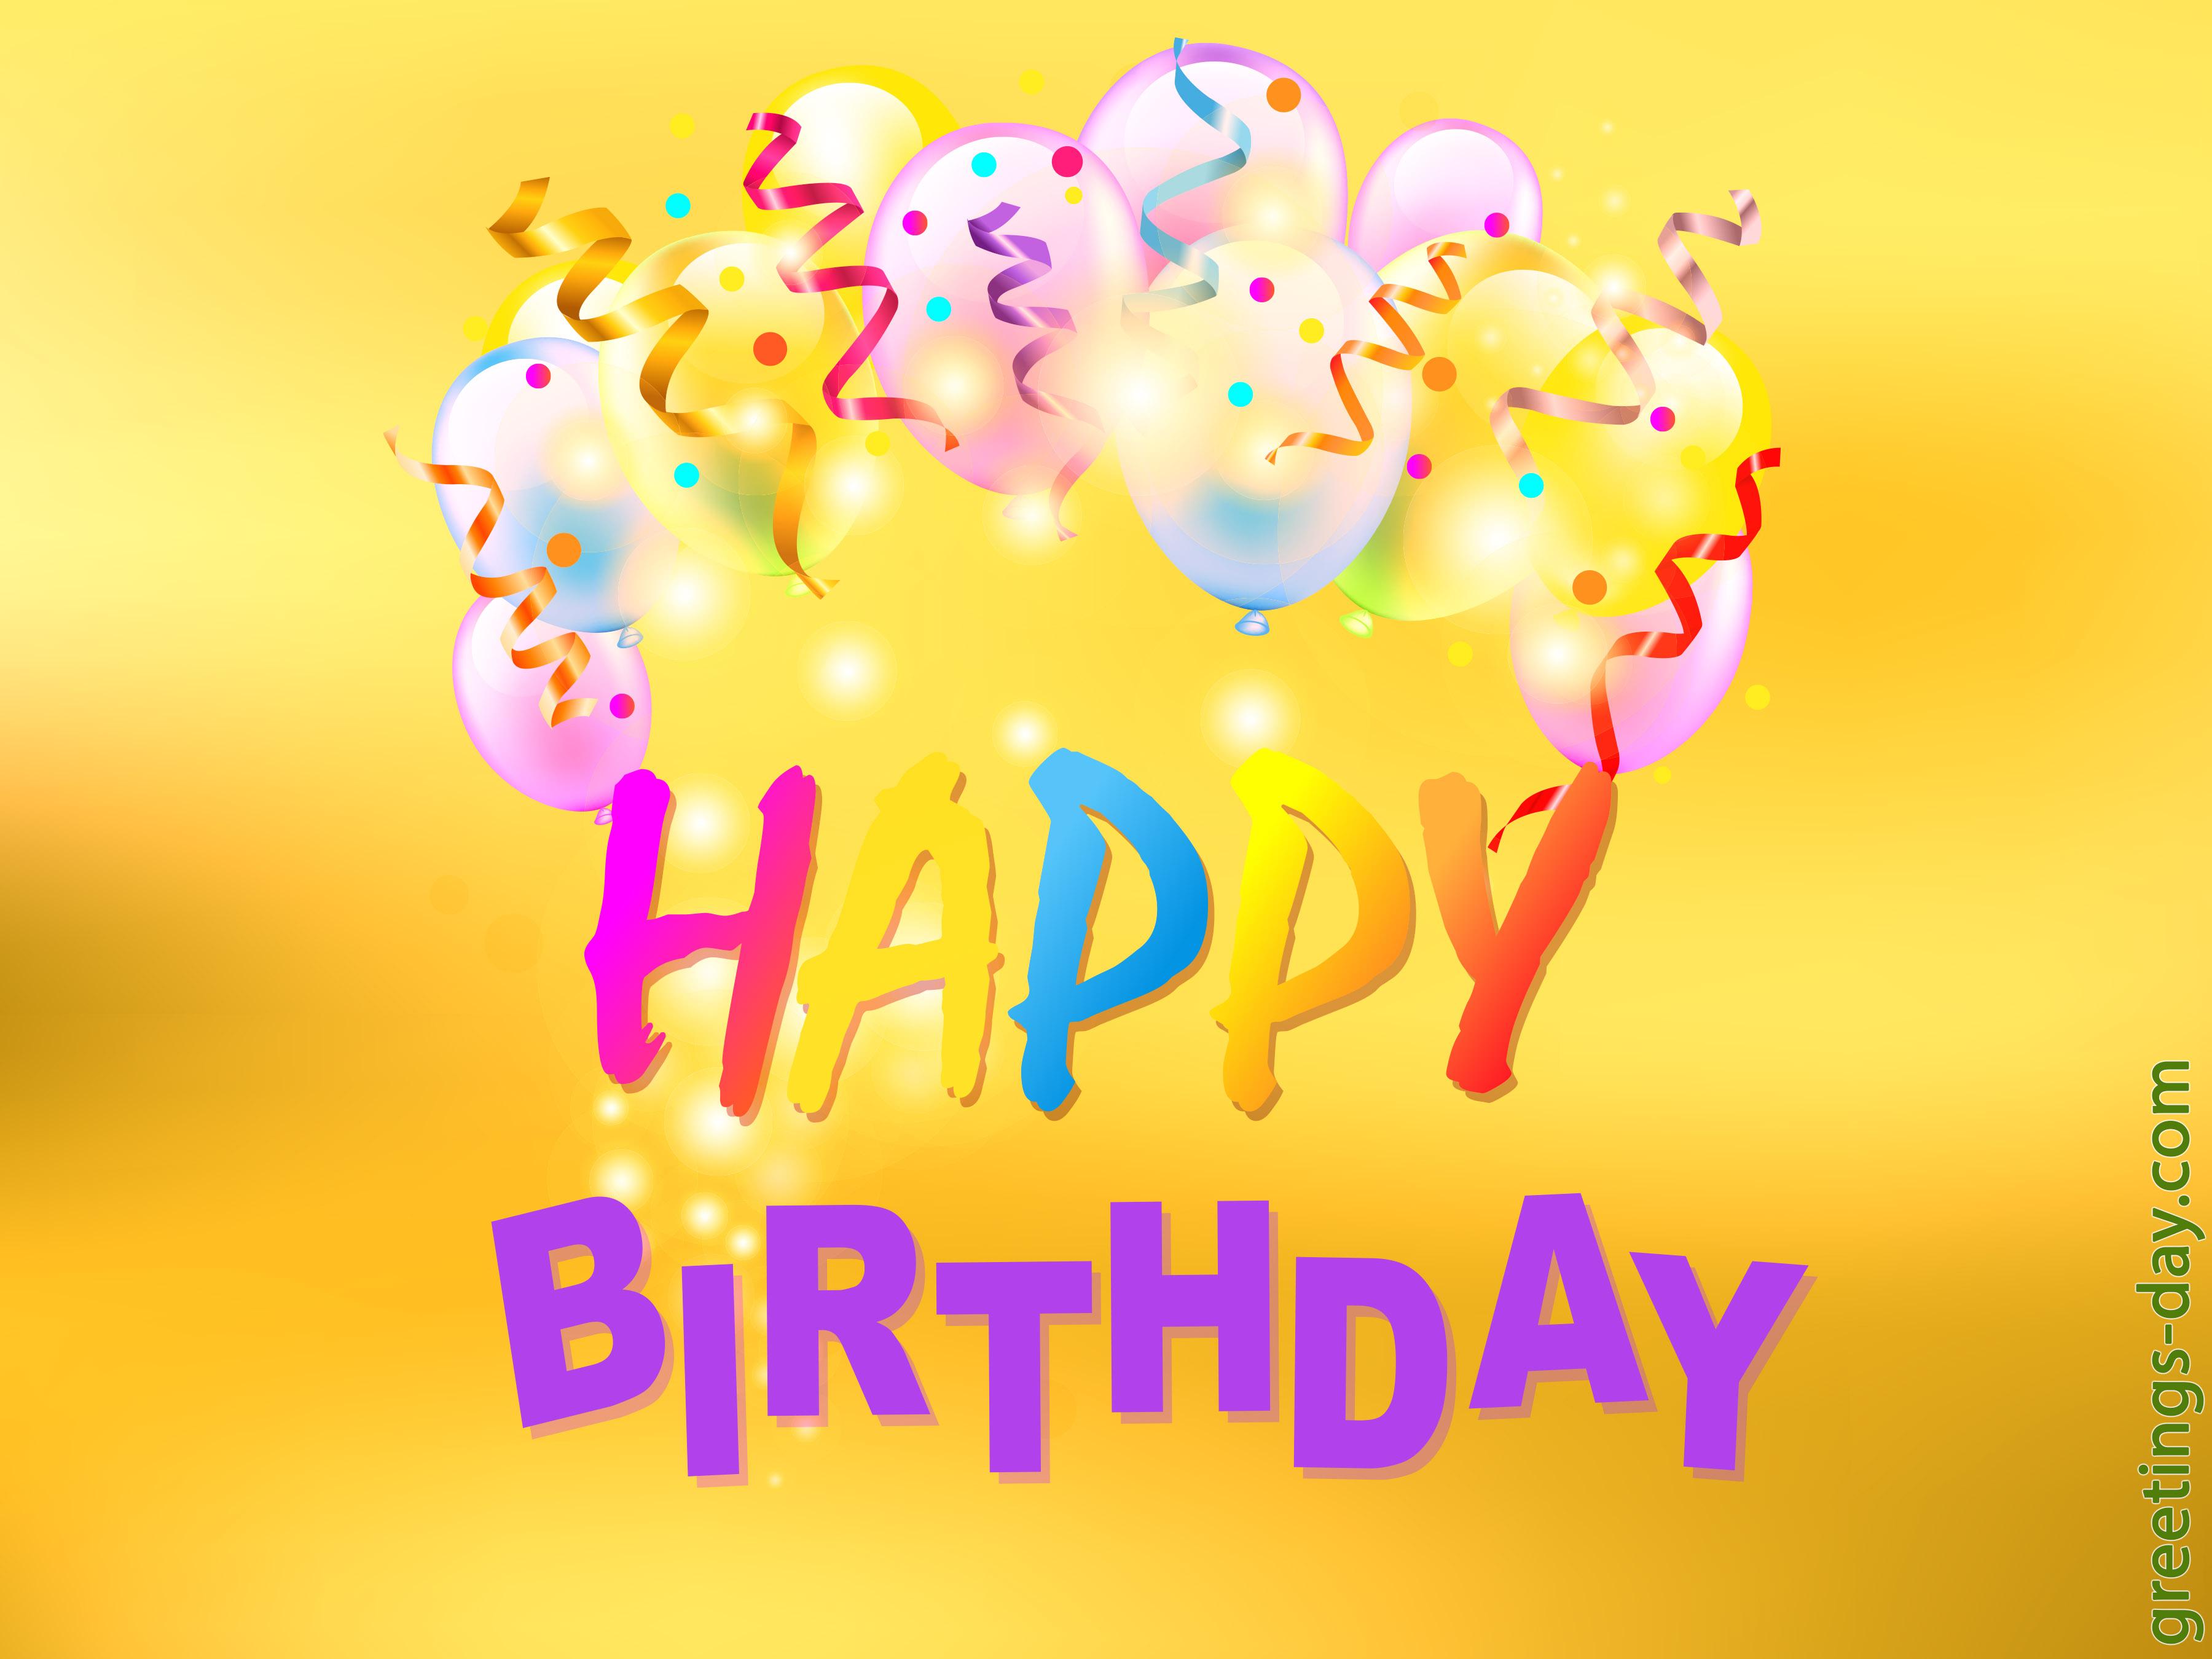 Happy Birthday card 23 06 05 ⋆ Greeting Cards Animated